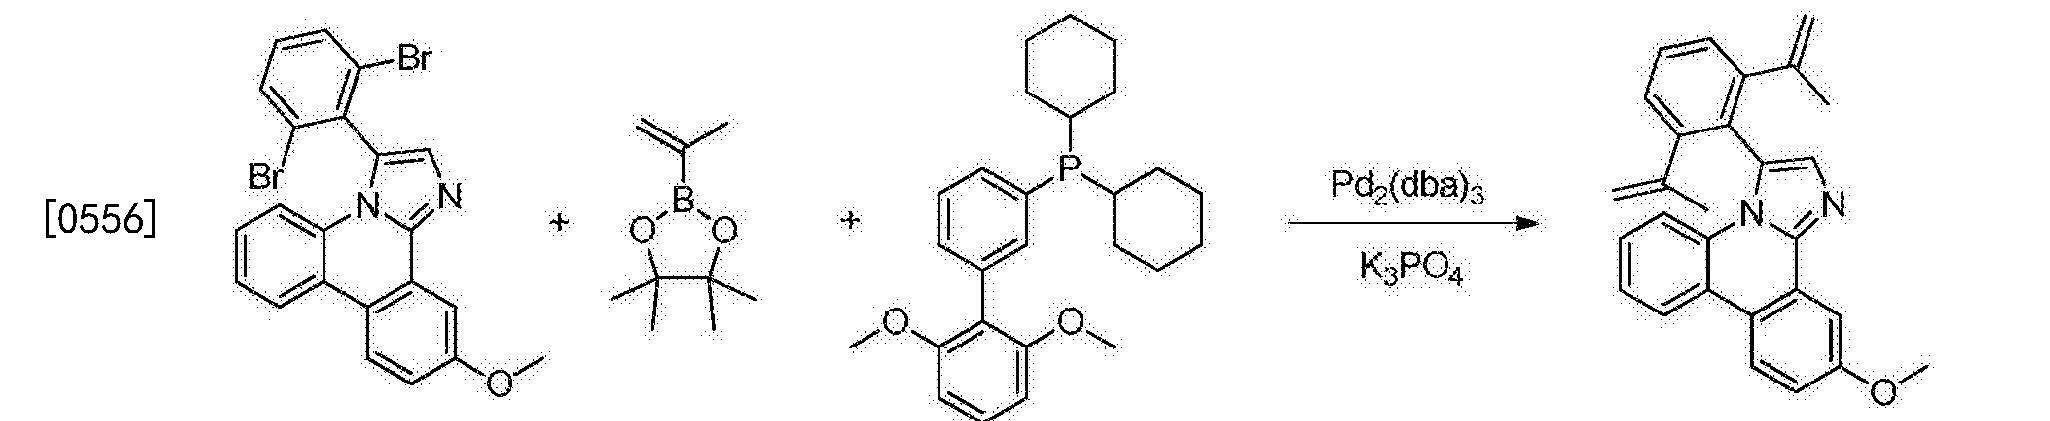 Figure CN106749425AD01602